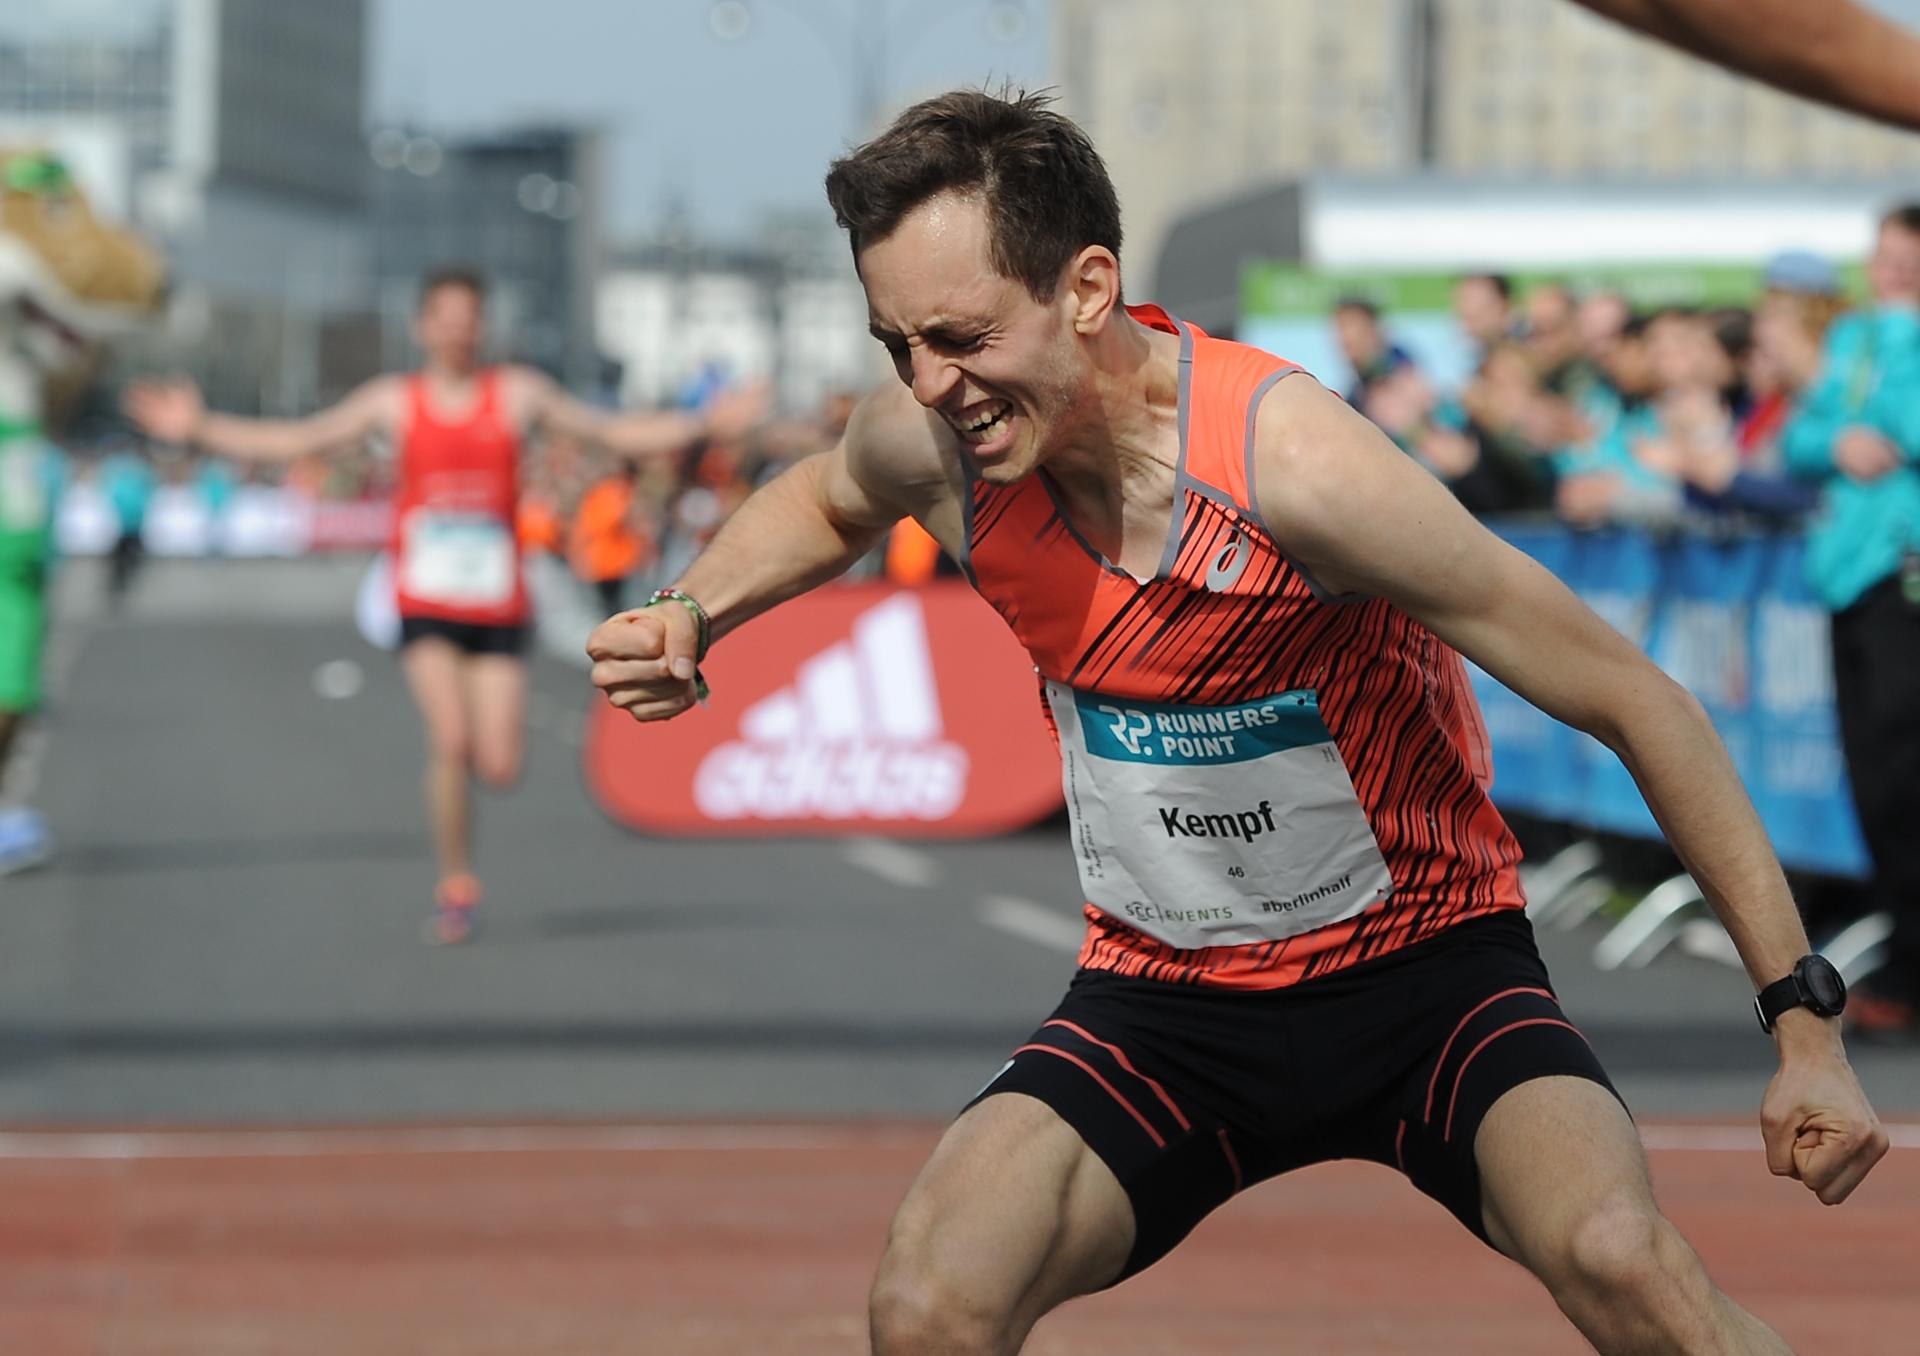 Freude im Ziel beim Halbmarathon in Berlin